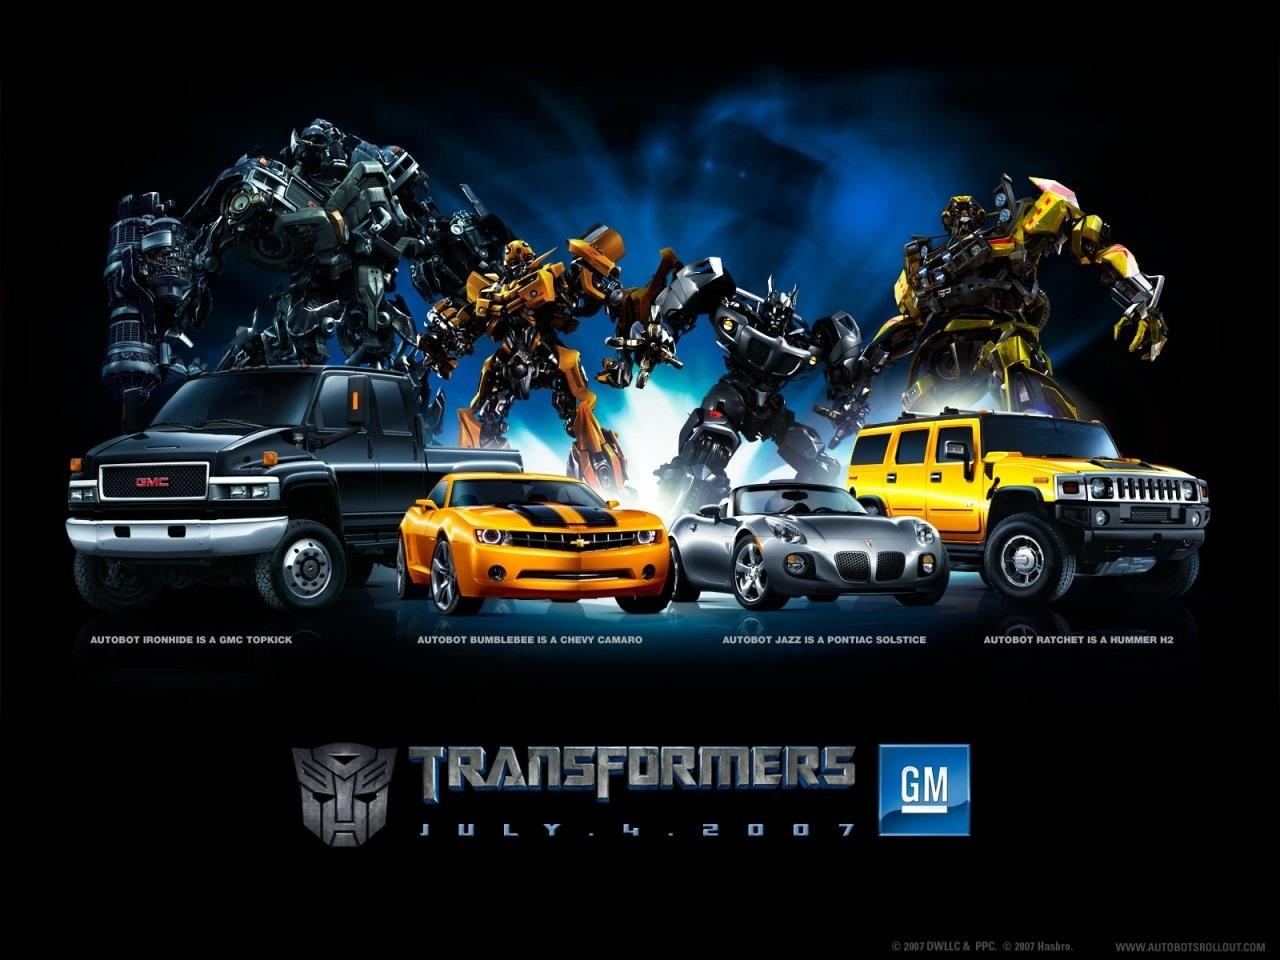 45 Transformers Live Wallpaper On Wallpapersafari